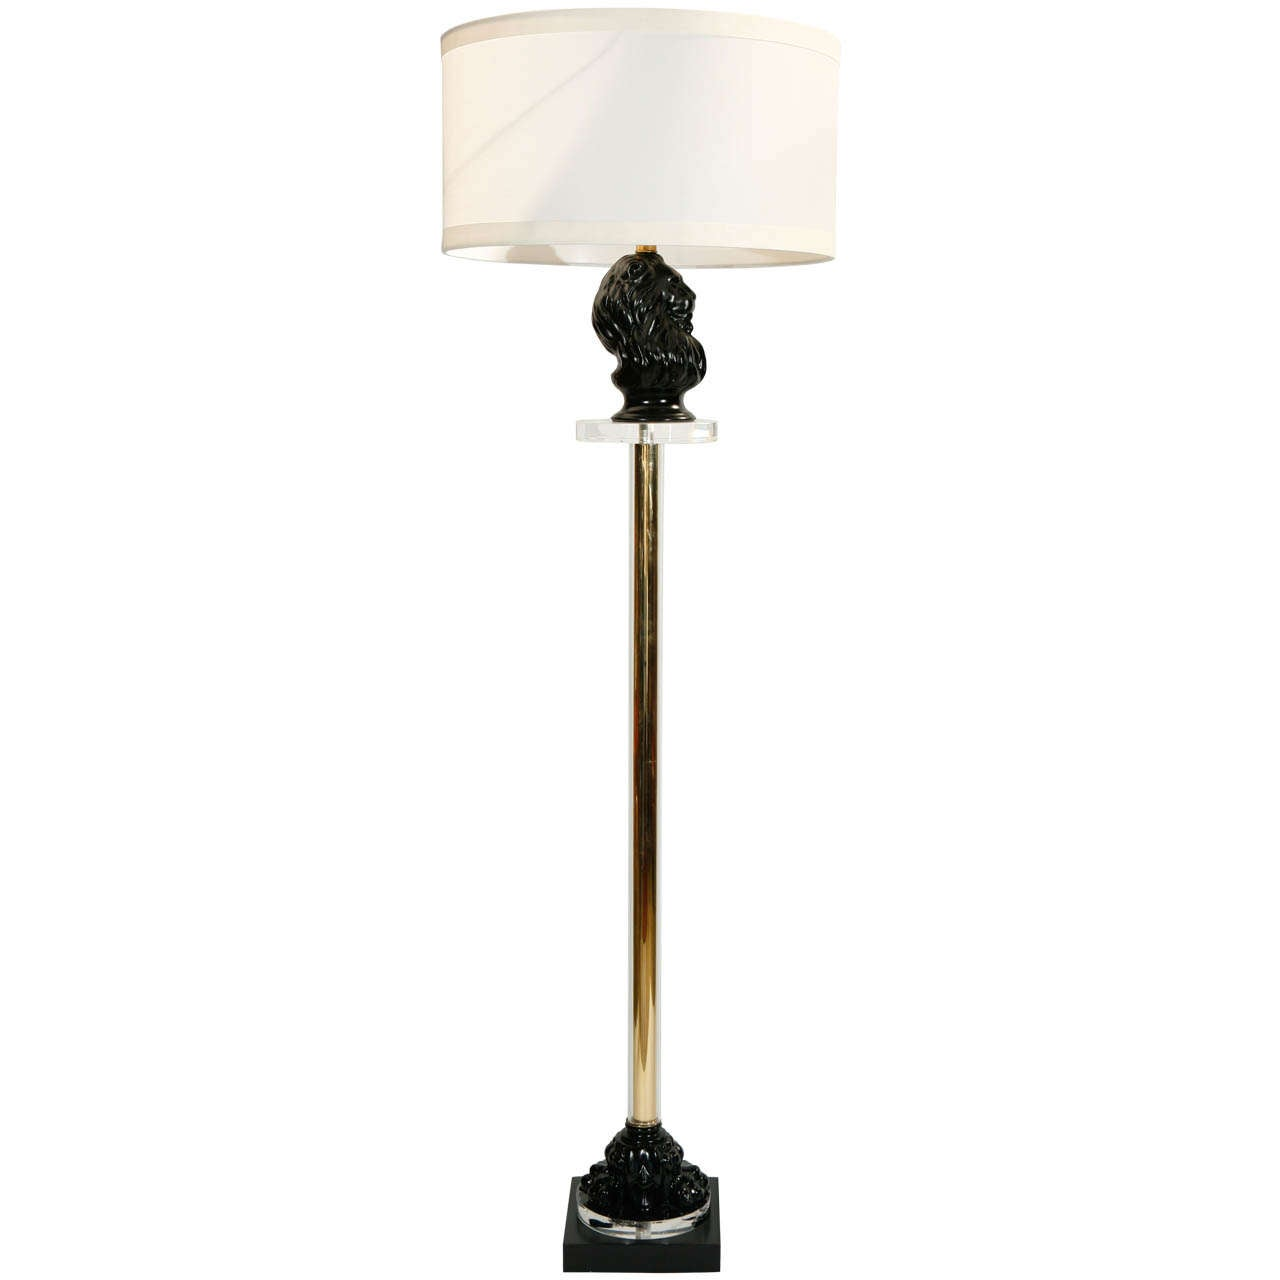 Hollywood regency black lion floor lamp at 1stdibs for Retro hollywood floor lamp